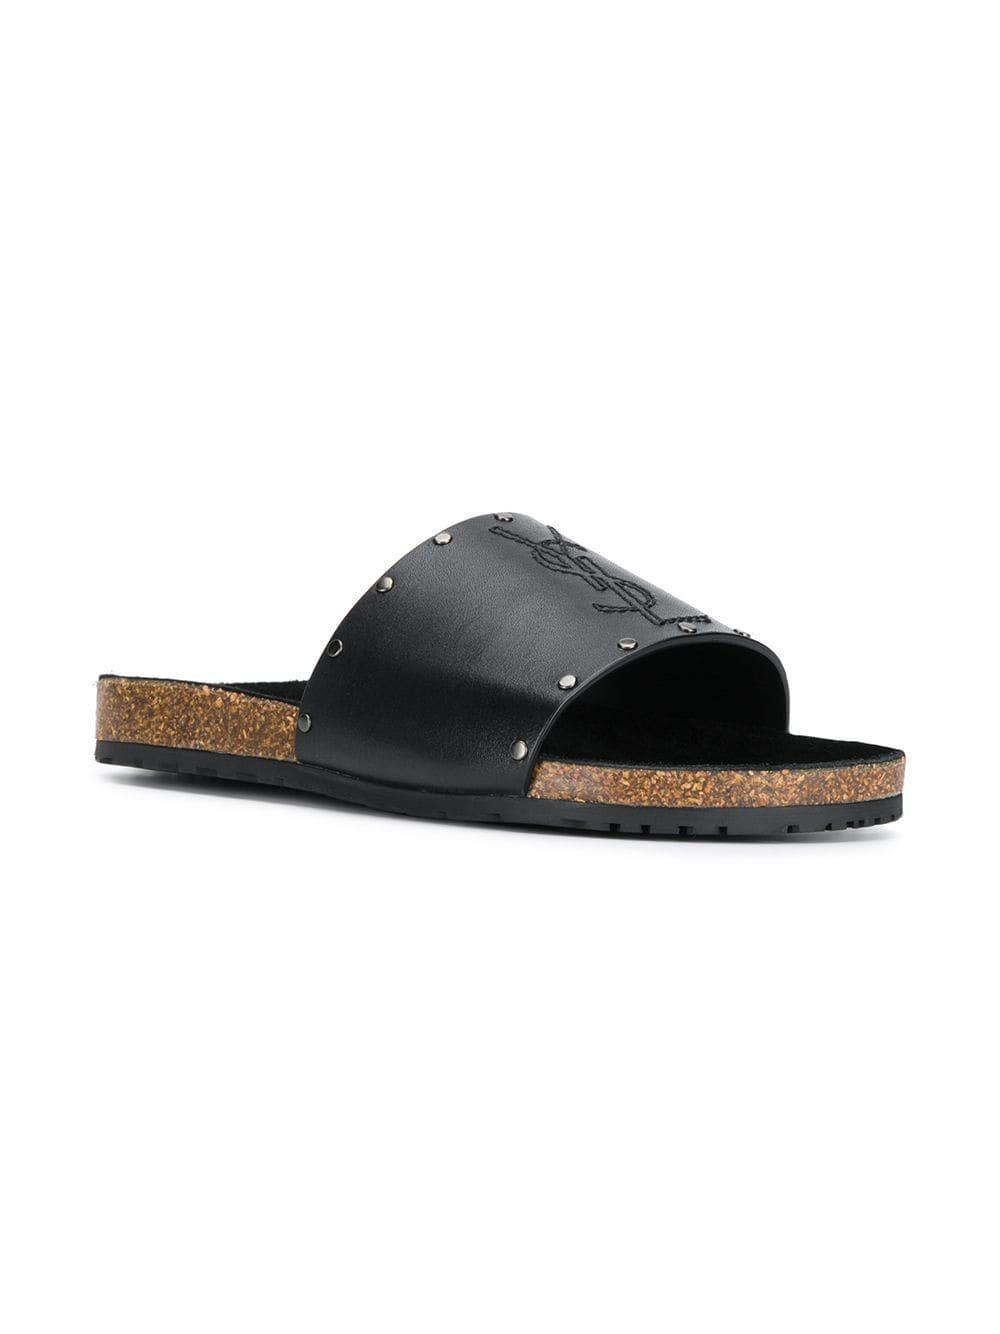 c1c737f02865 Lyst - Saint Laurent Jimmy Slide Sandals in Black for Men